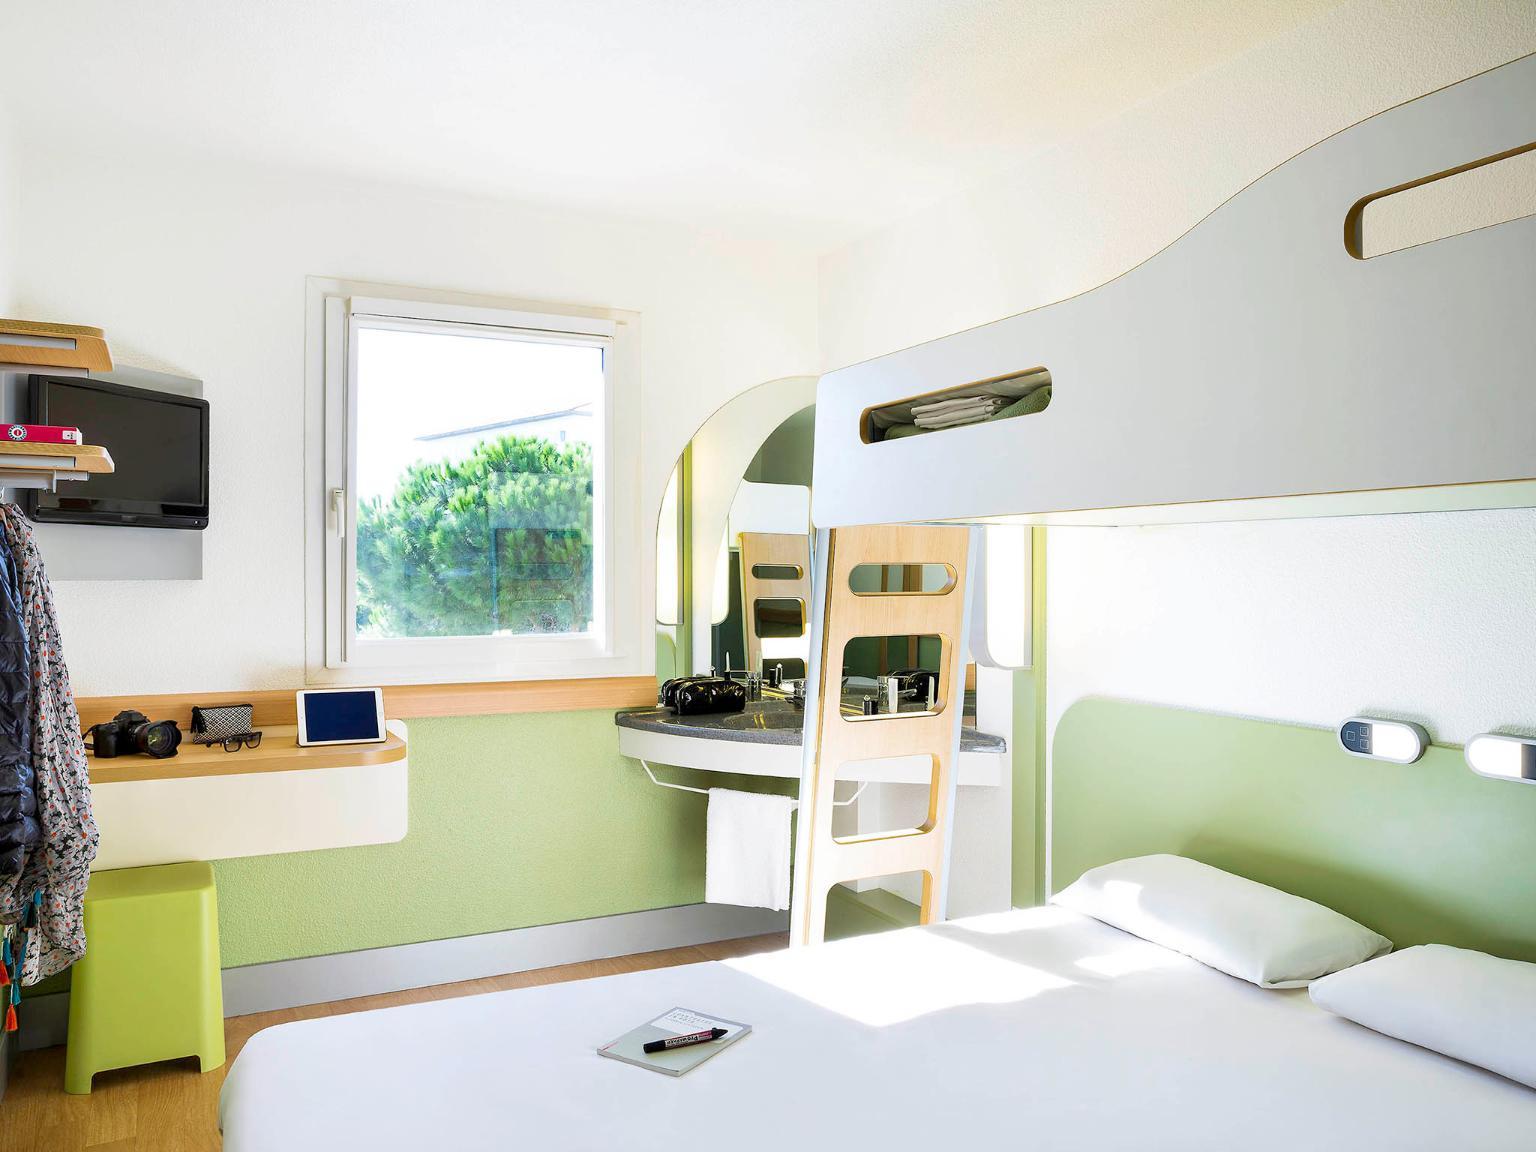 ibis budget perpignan nord h tel rue alfred sauvy 66600. Black Bedroom Furniture Sets. Home Design Ideas